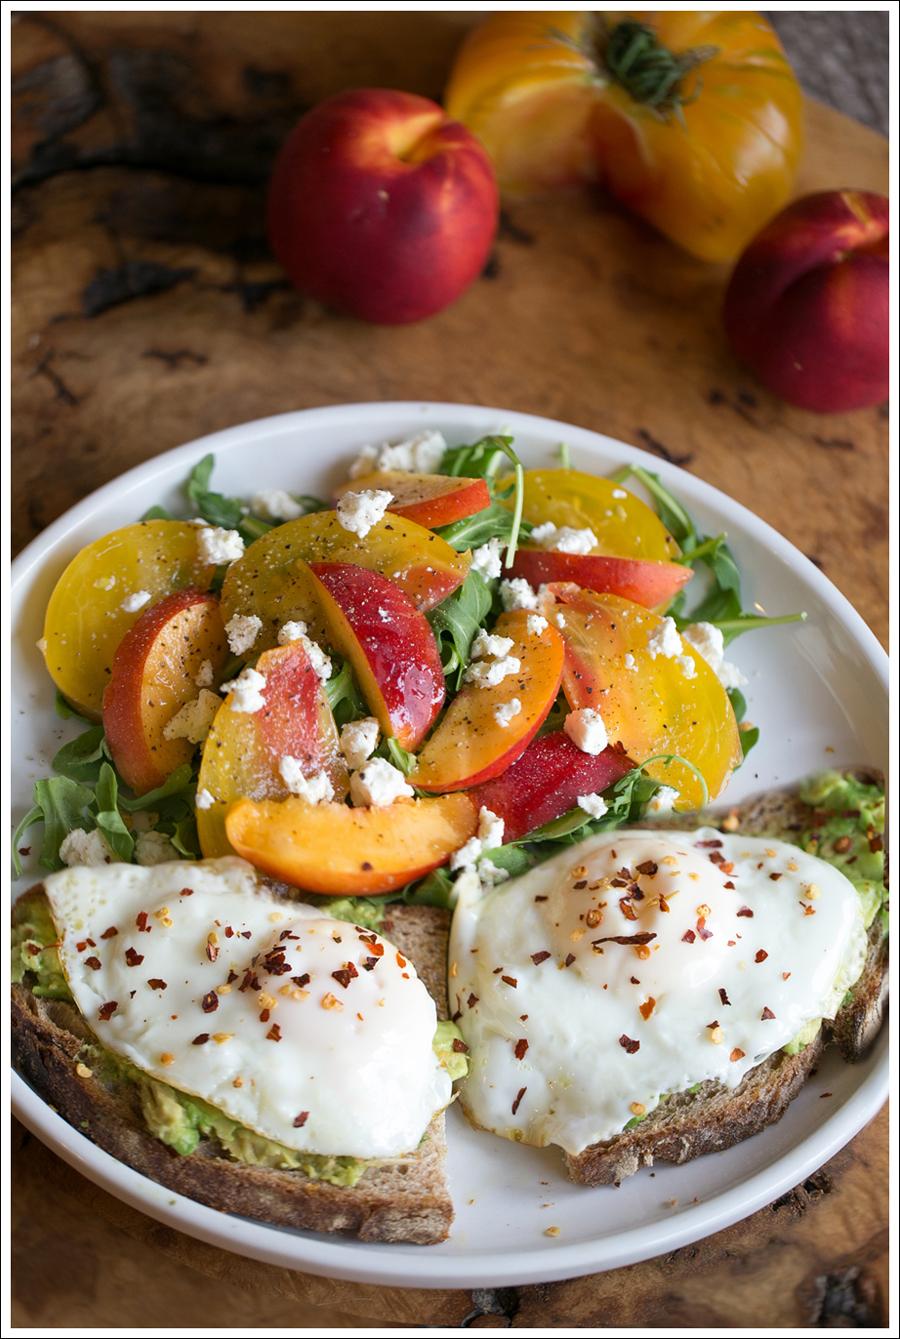 Blog Heirloom Tomato Nectarine Goat Cheese and Arugula Salad with Avocado Toast and Fried Egg-6